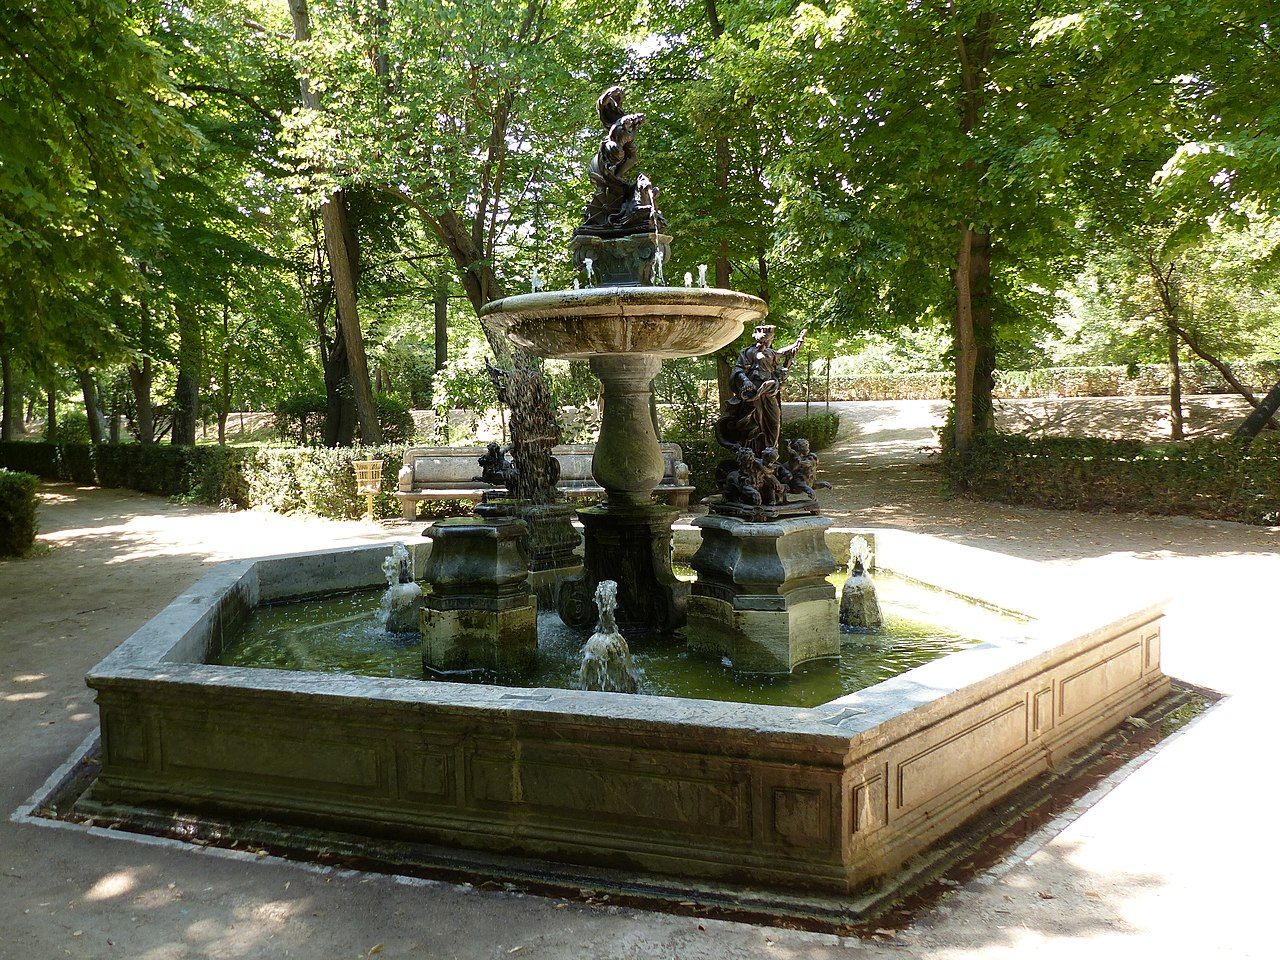 File jard n de la isla aranjuez madrid espa a 2016 34 for Jardin de la isla aranjuez